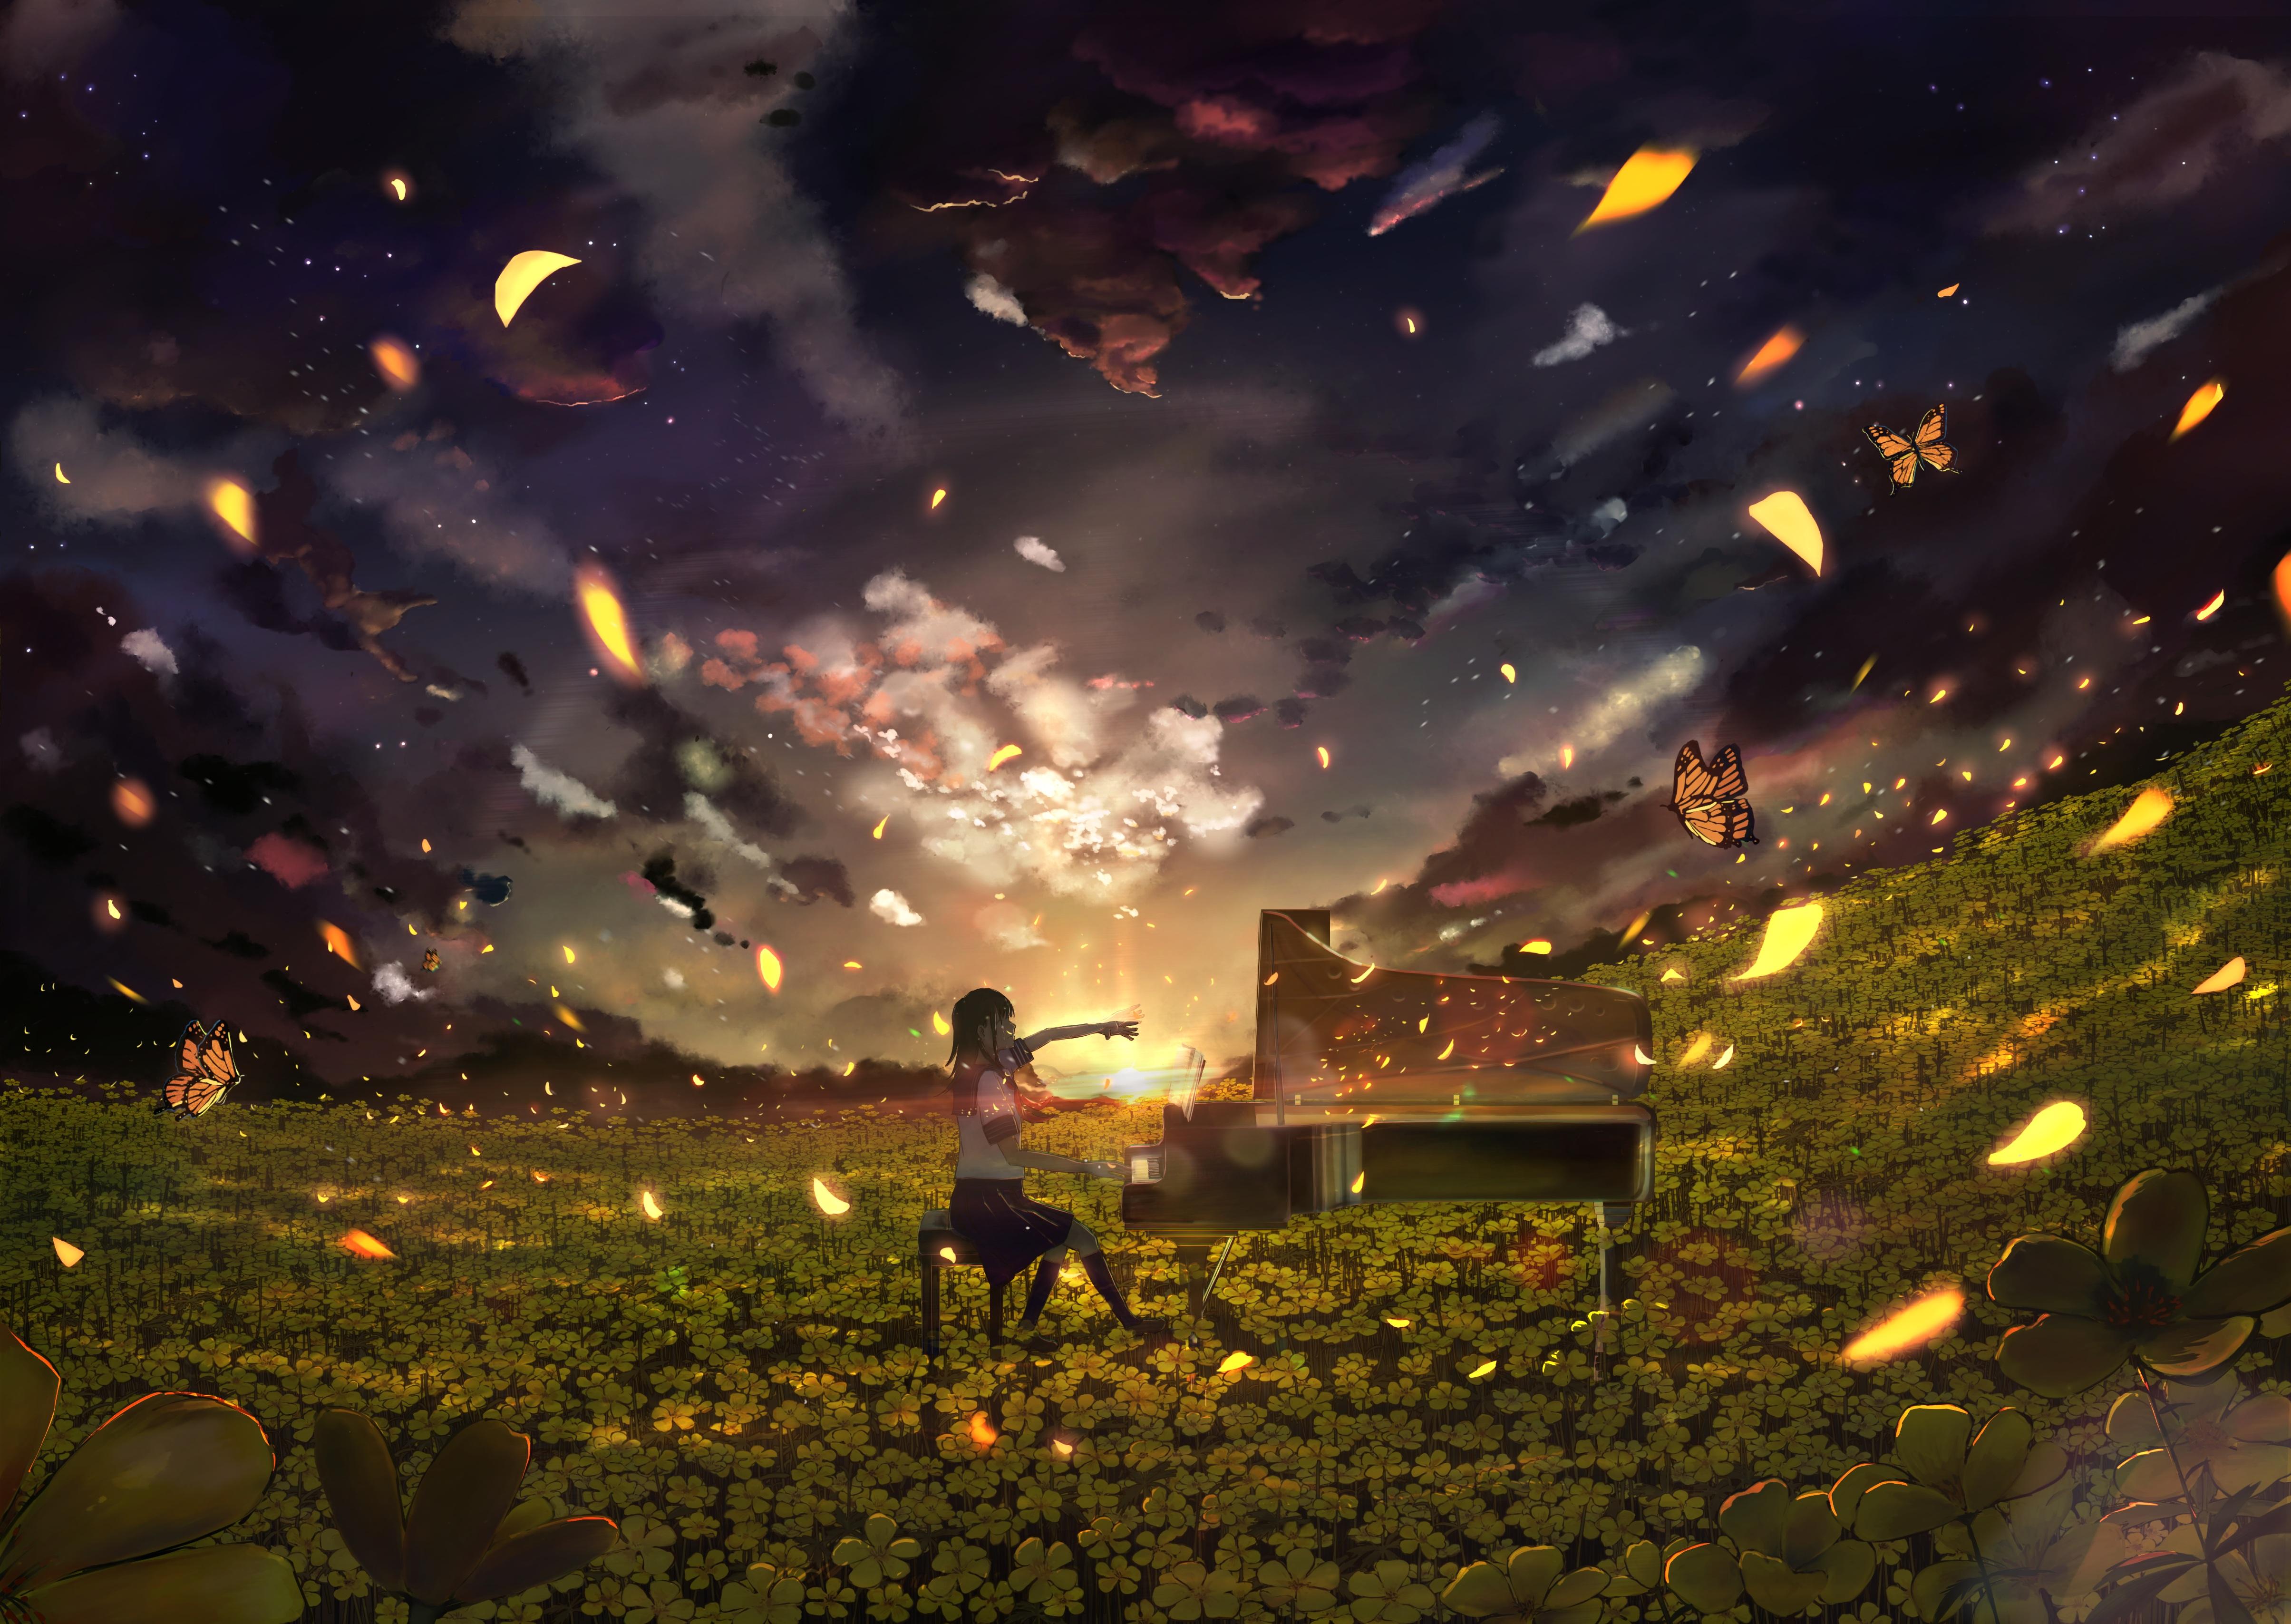 Anime 4818x3415 anime anime sky anime girls digital digital art artwork sky skyscape nature flowers yellow flower women dusk sunset Sun sun rays sunrise sunlight landscape piano pianists evening schoolgirl butterfly school uniform